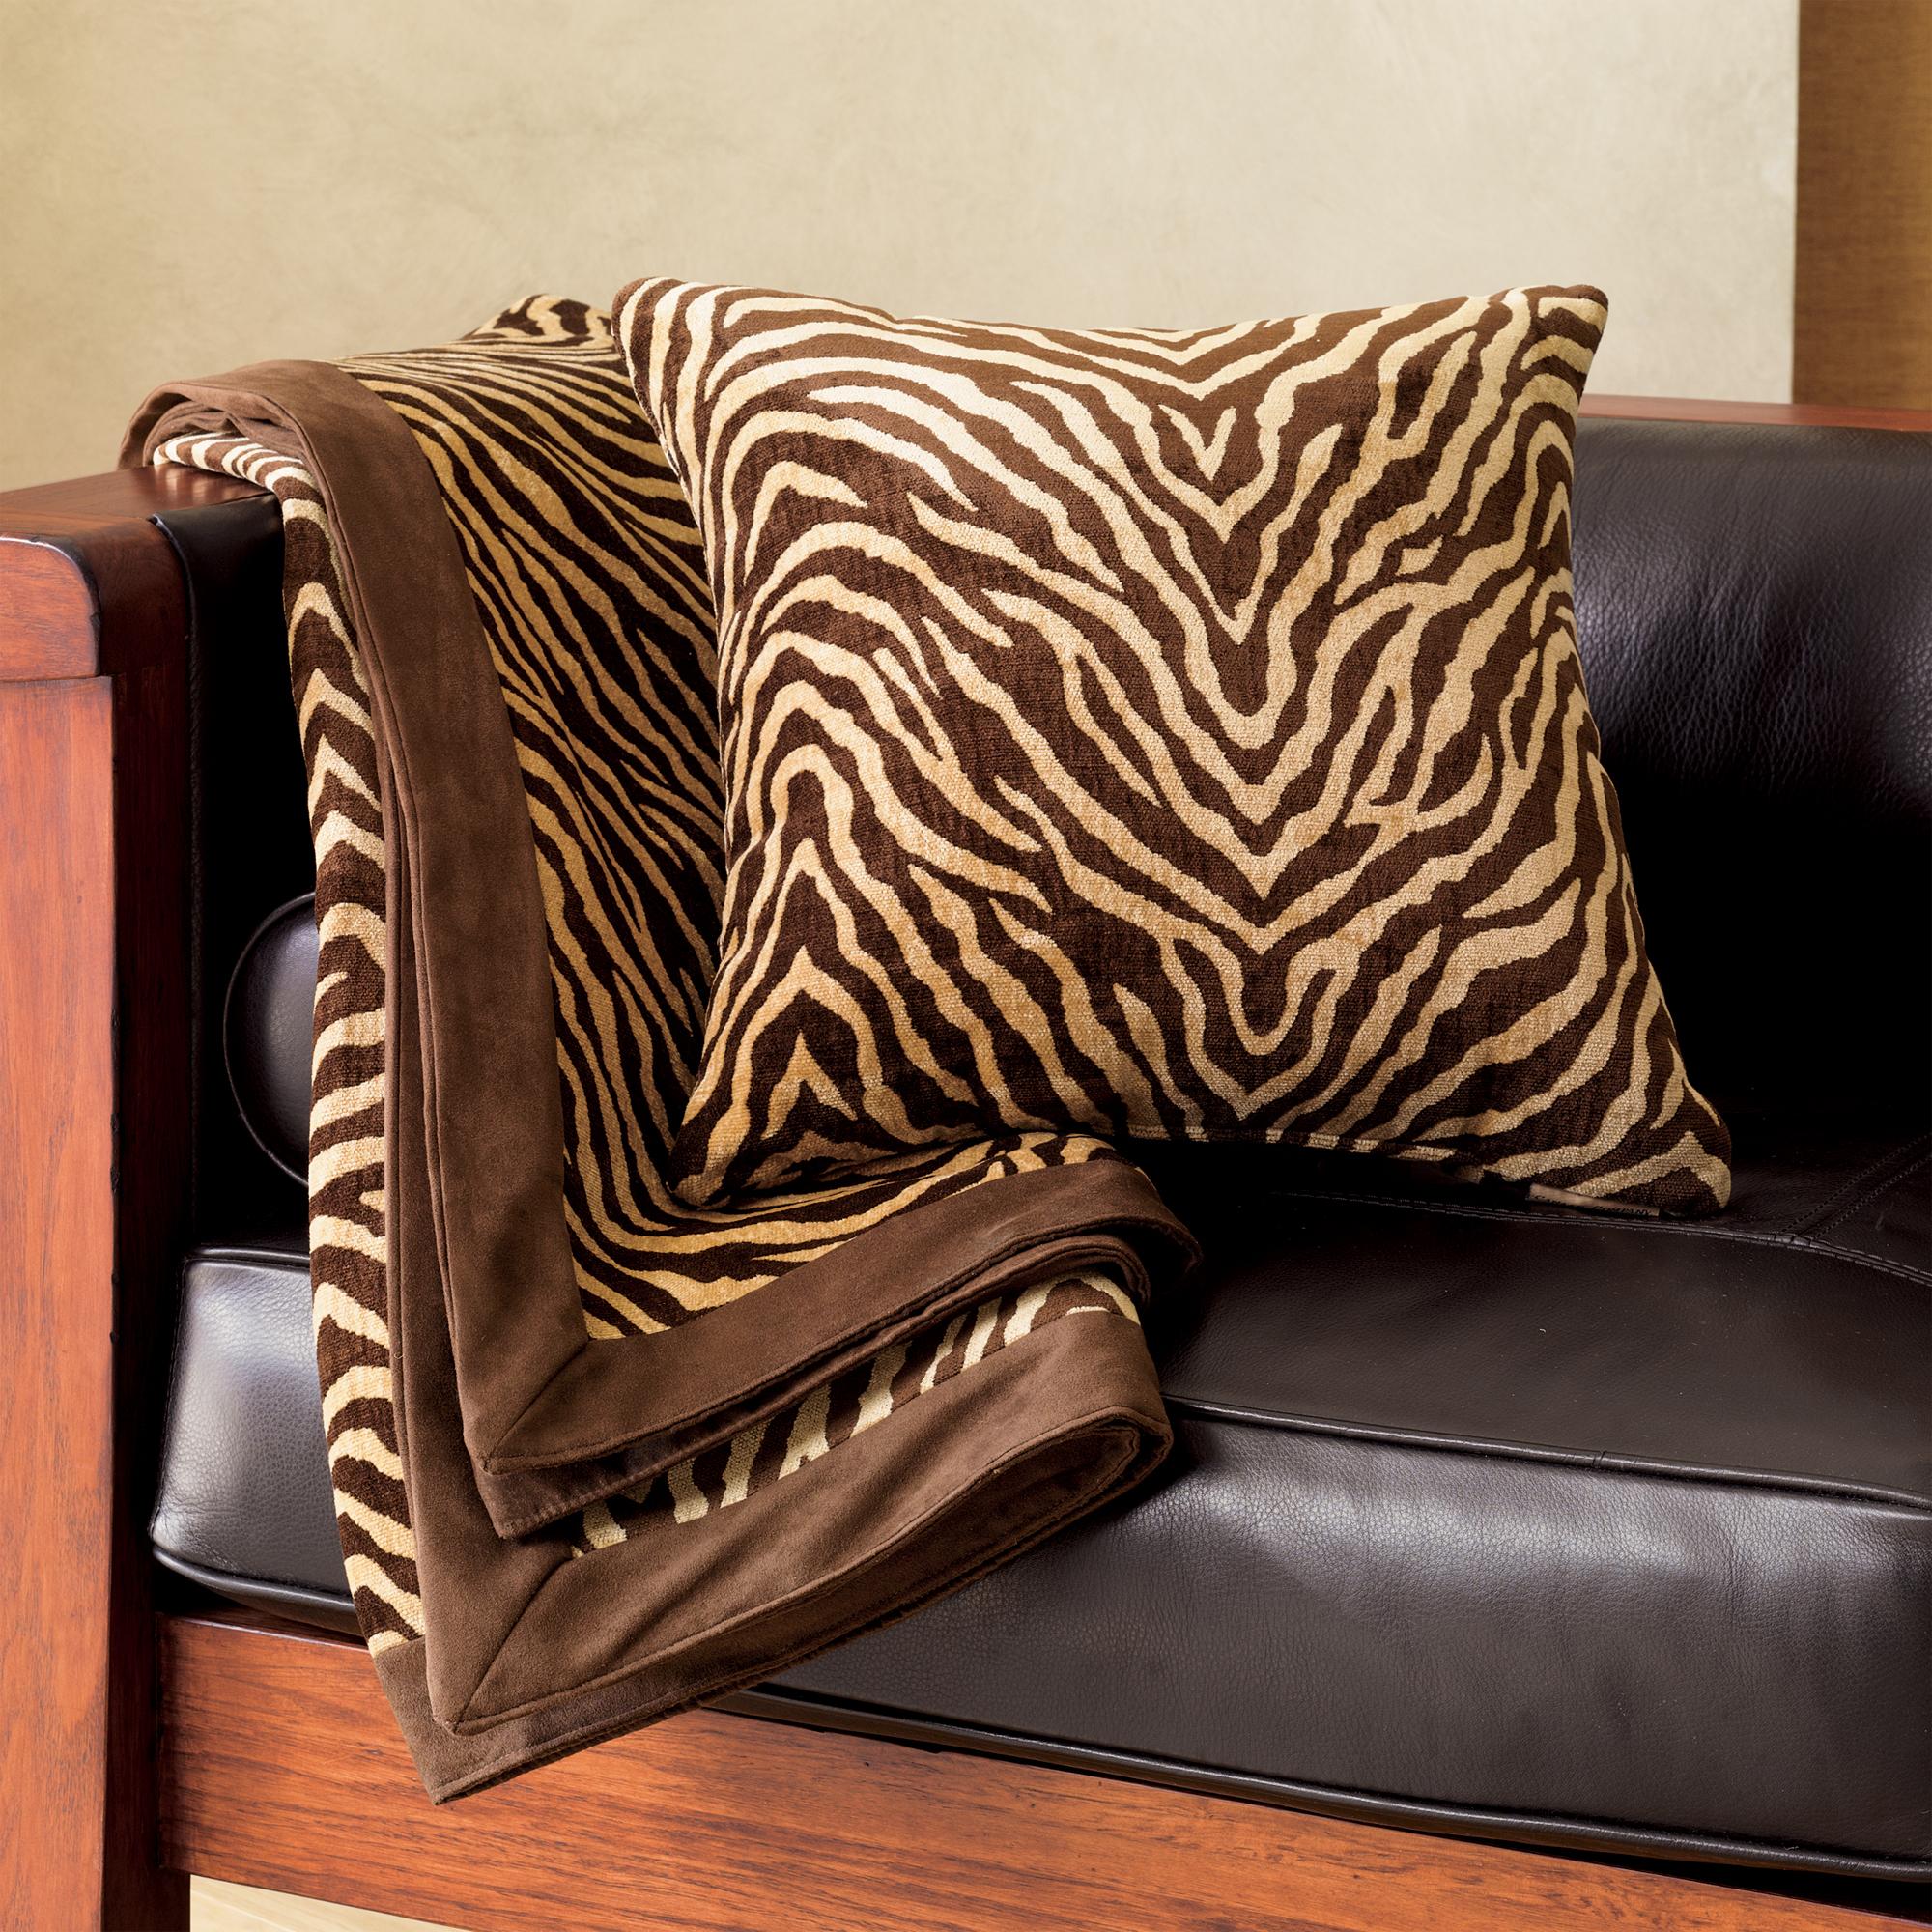 Throw Pillows Home : Plush Zebra Throw & Pillow Gump s